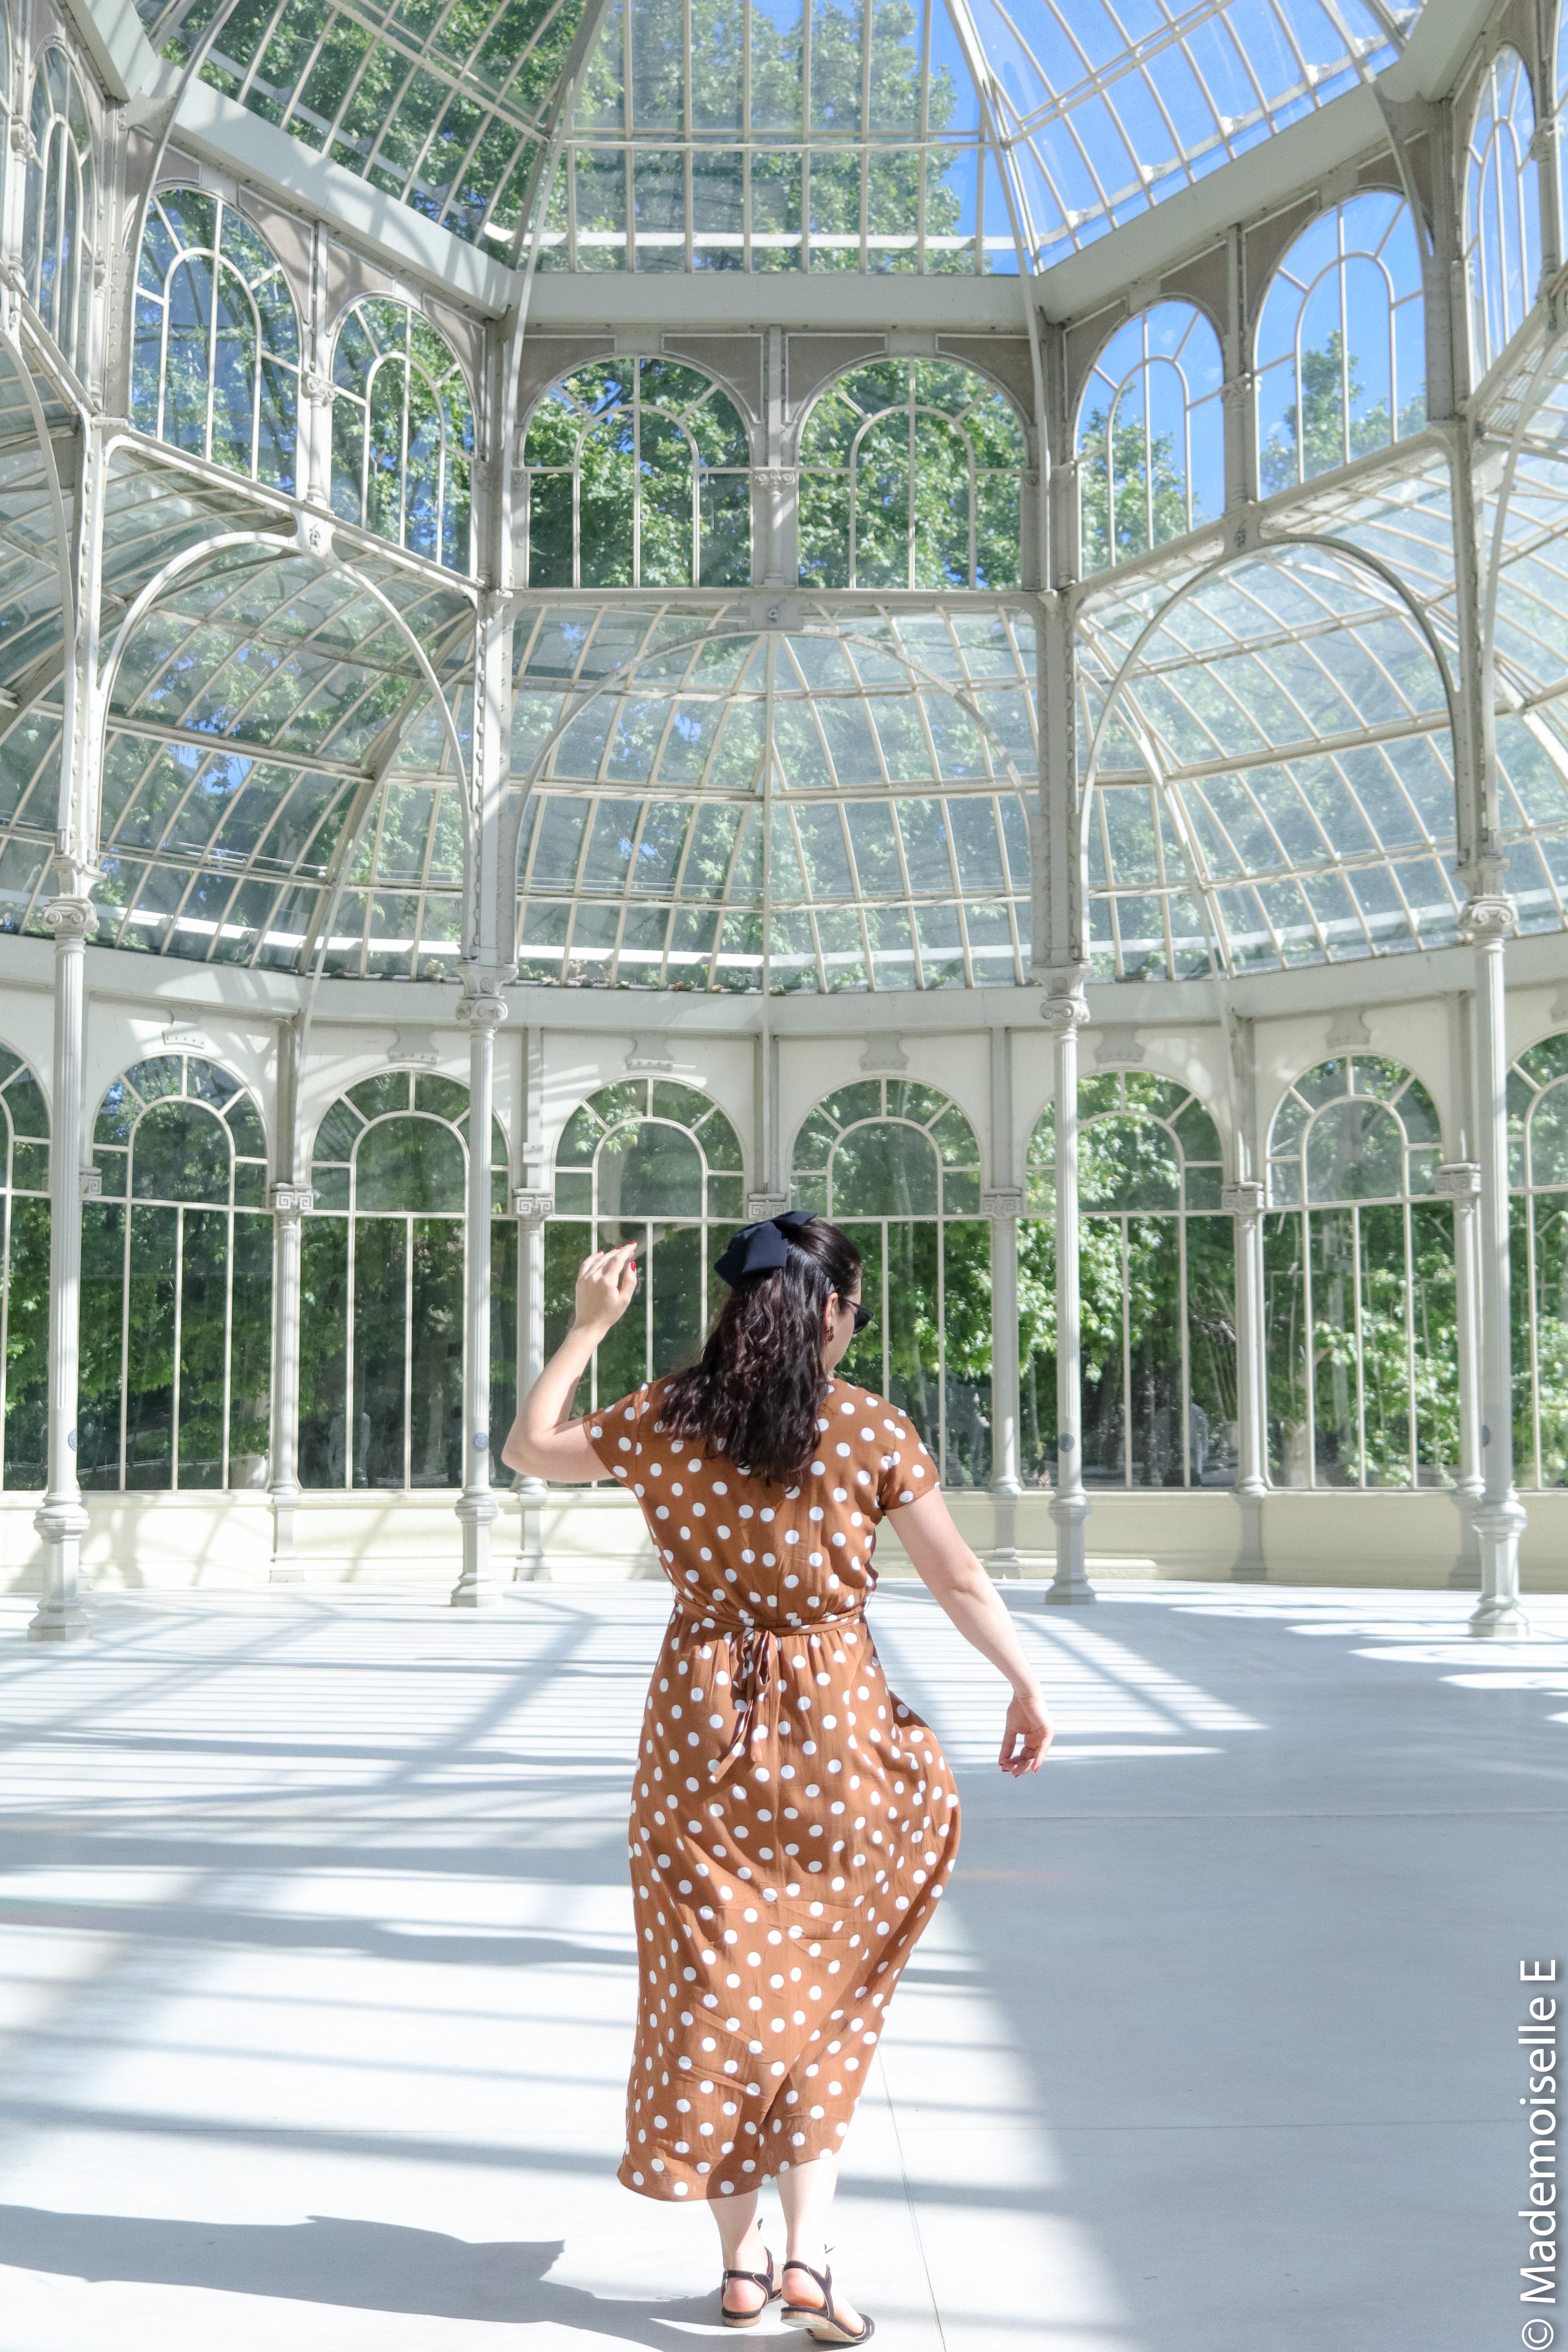 madrid-city-guide-bonnes-adresses-palacio-de-cristal-mademoiselle-e